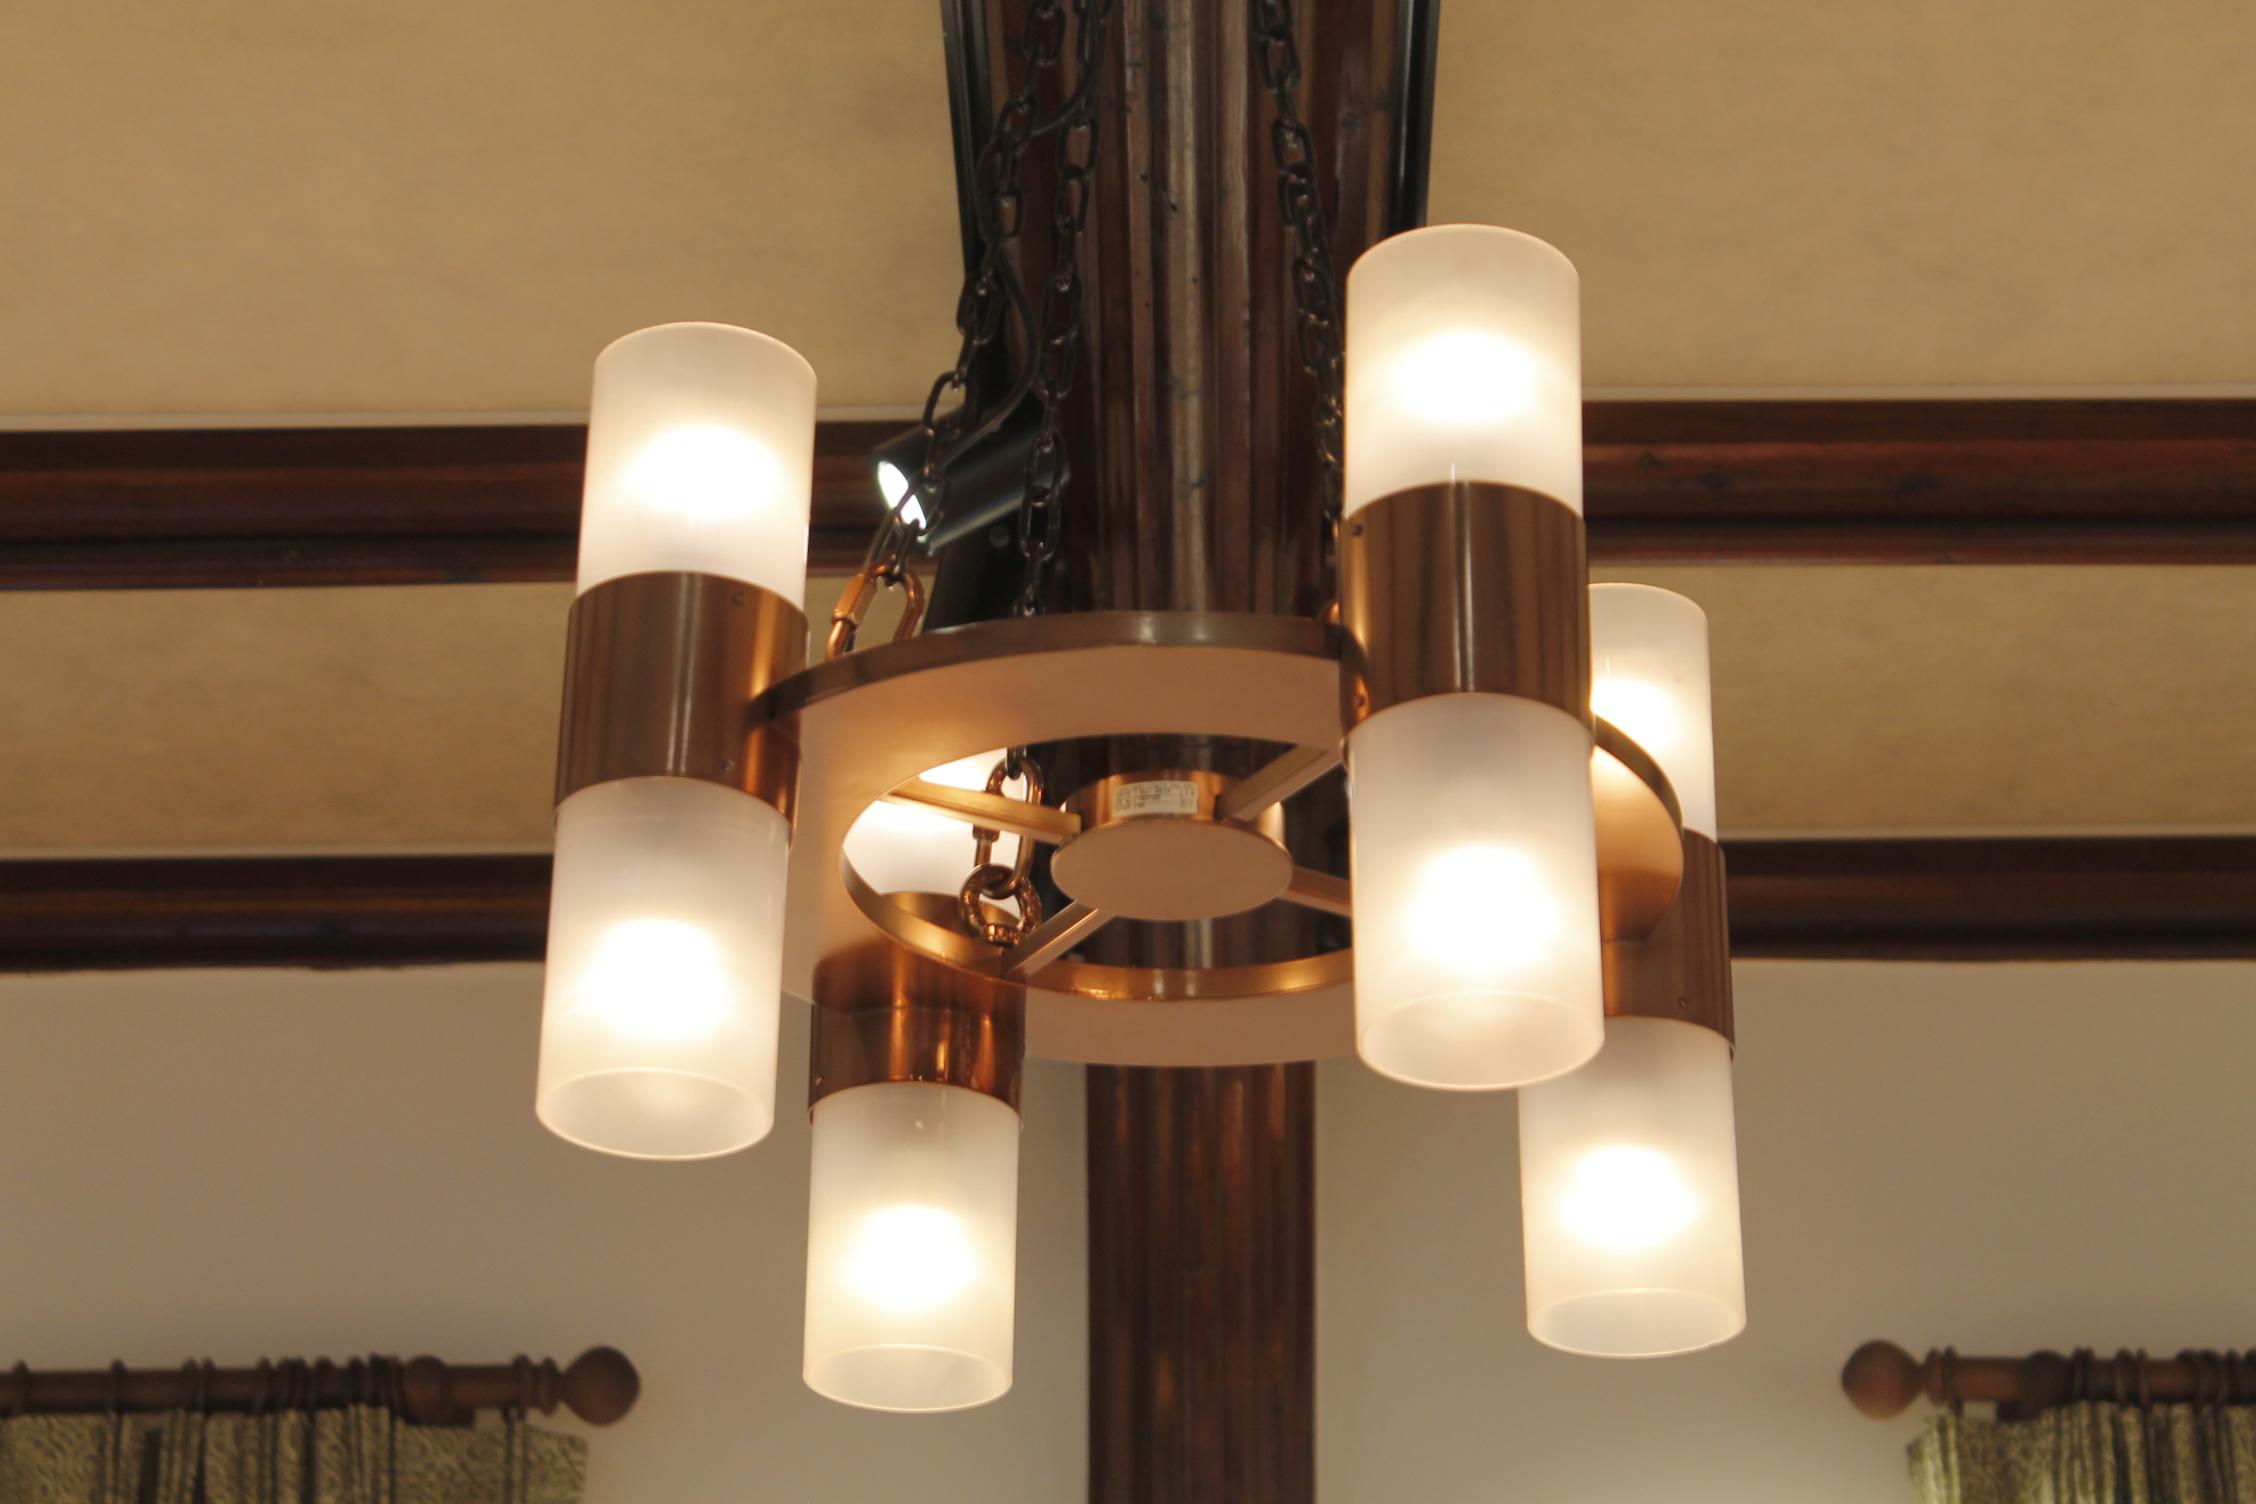 Bespoke programmable lighting